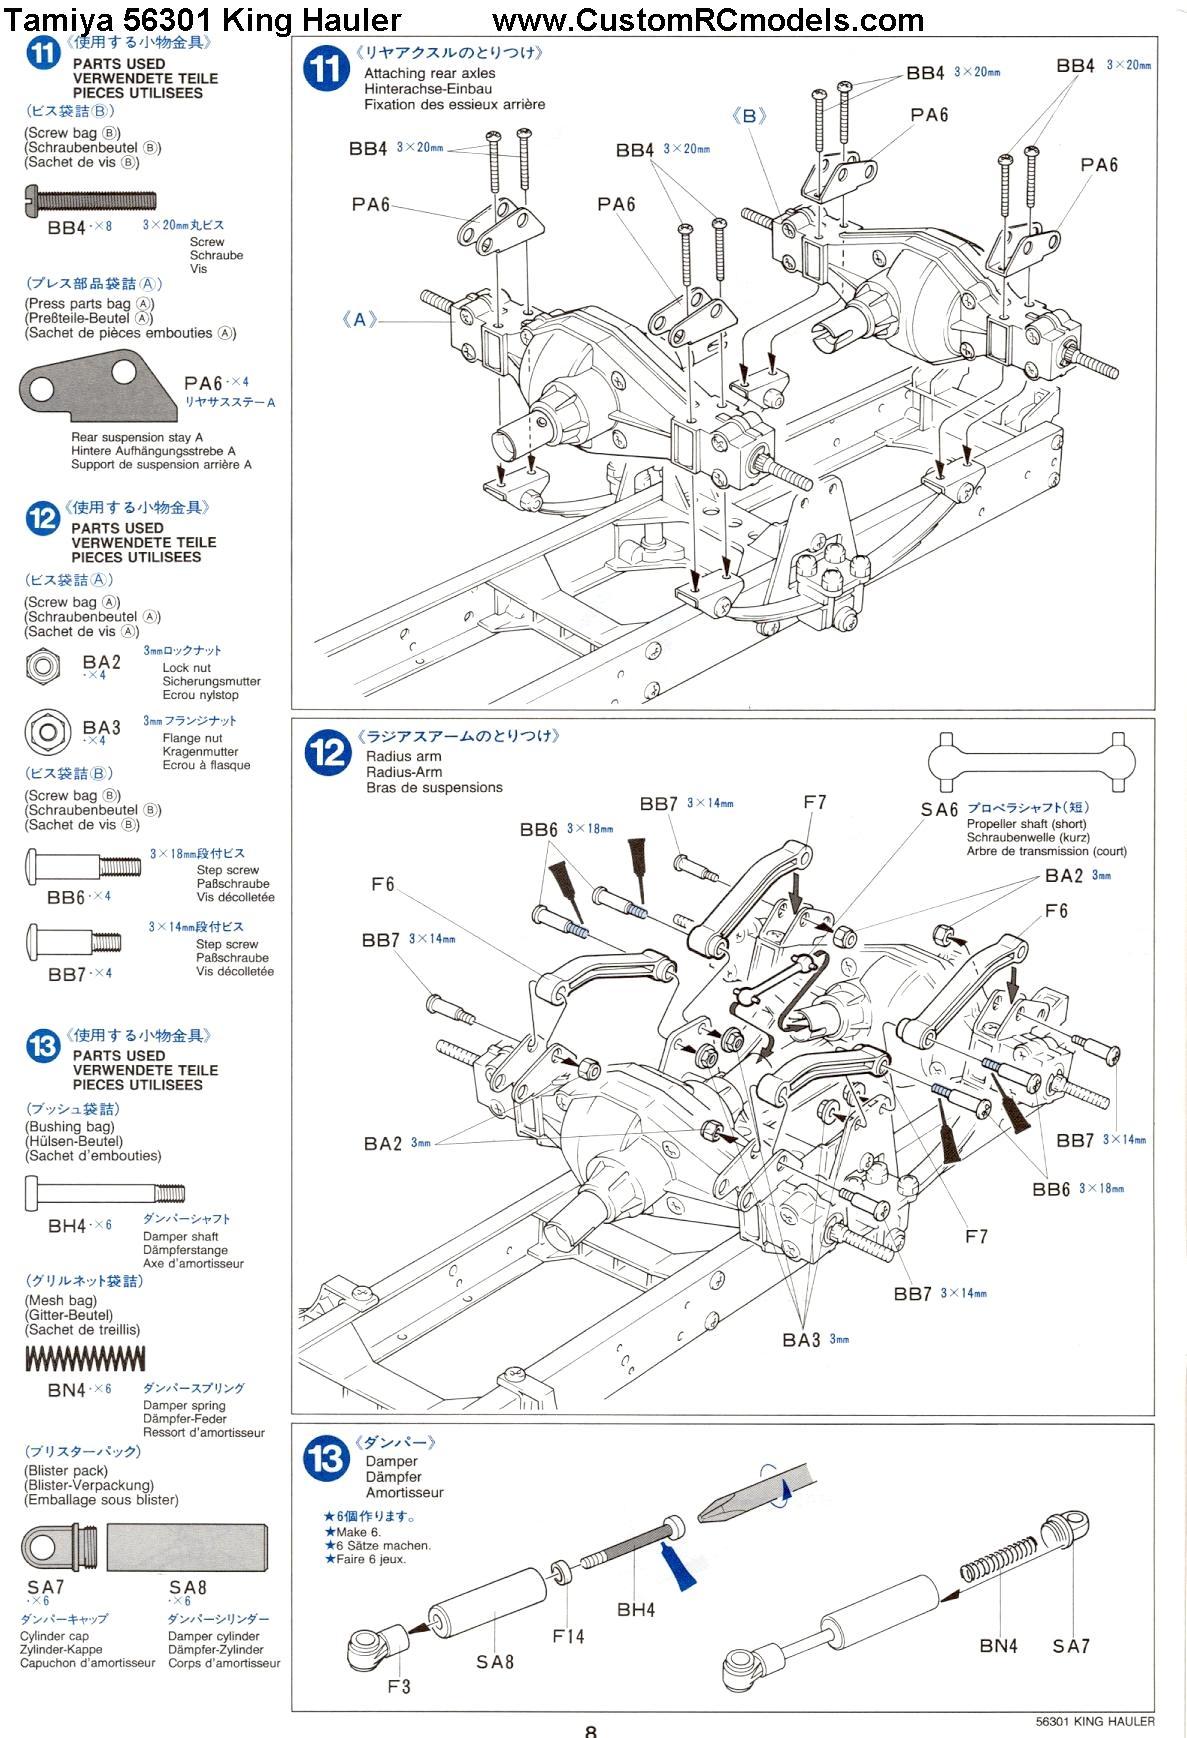 Sears Bandsaw Model 113.248340 Manual